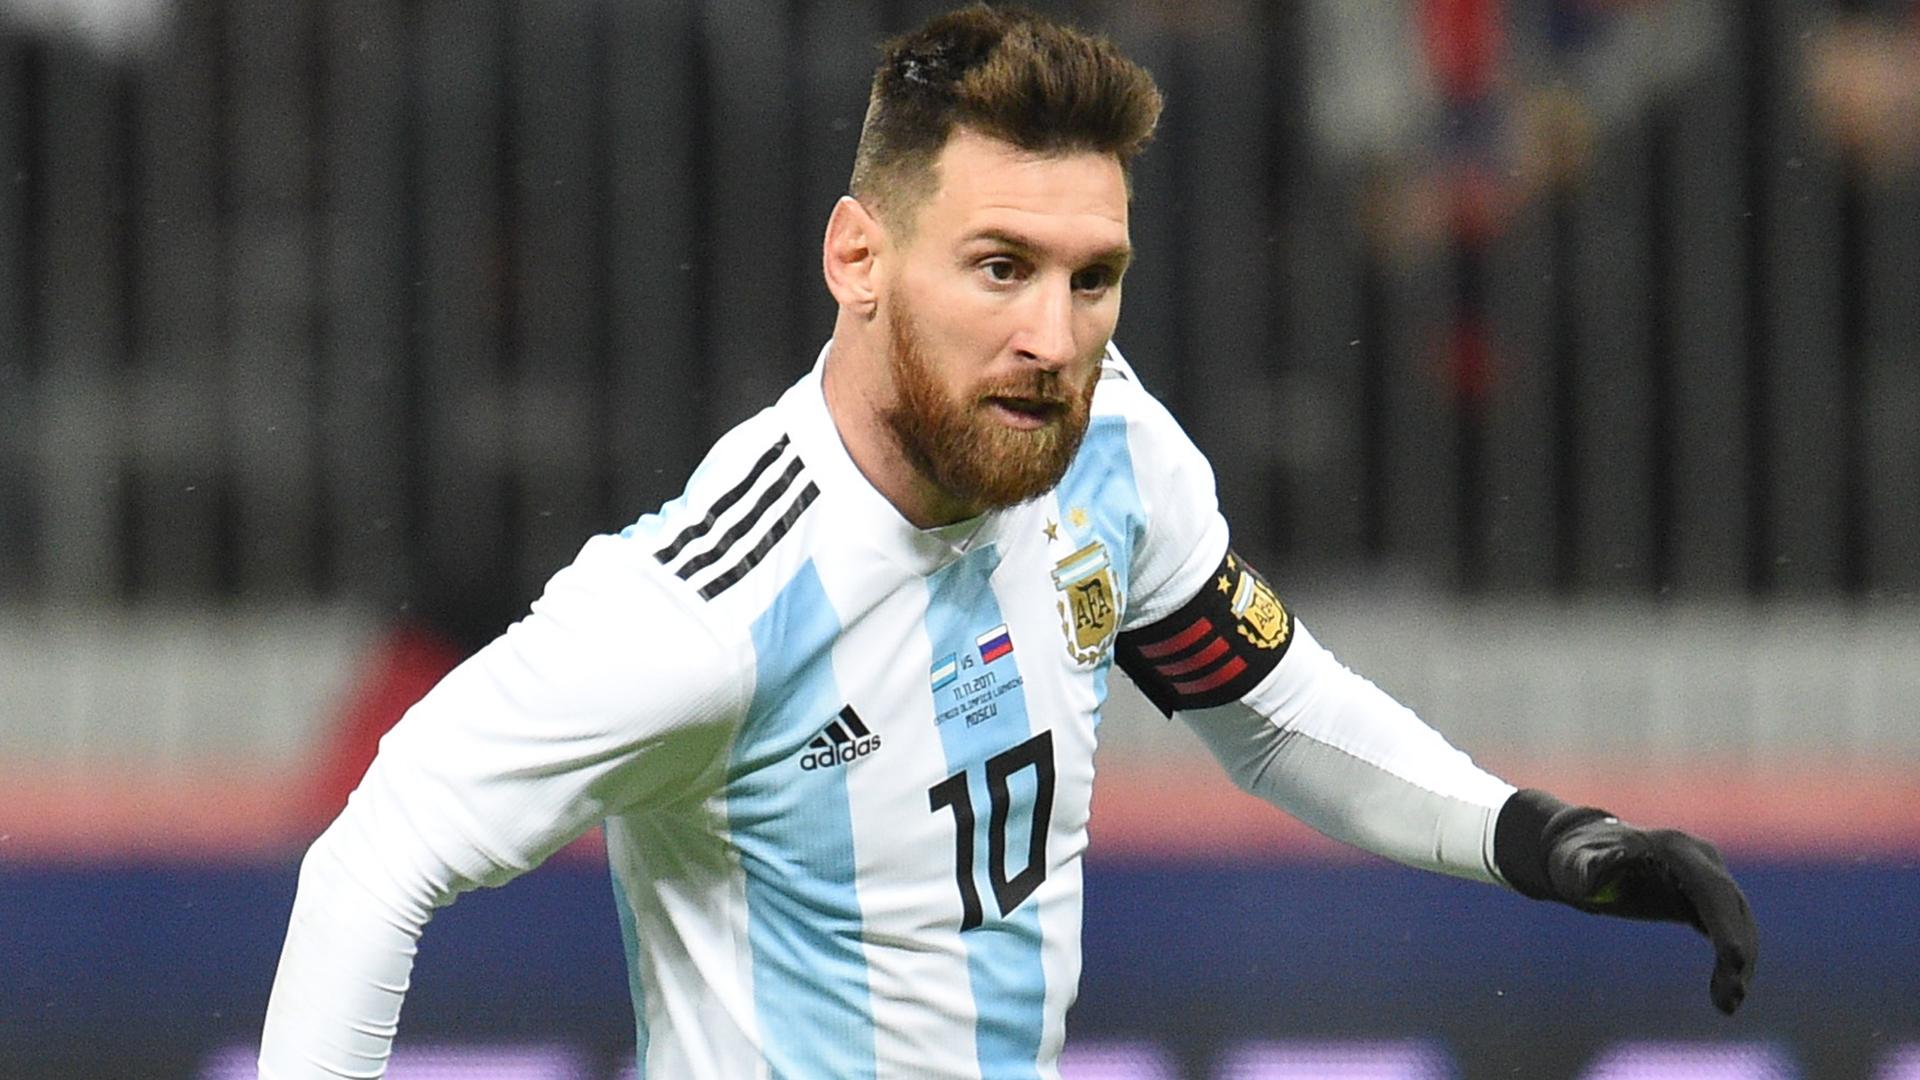 Lionel Messi can lead Argentina to World Cup success u2013 Juan Roman